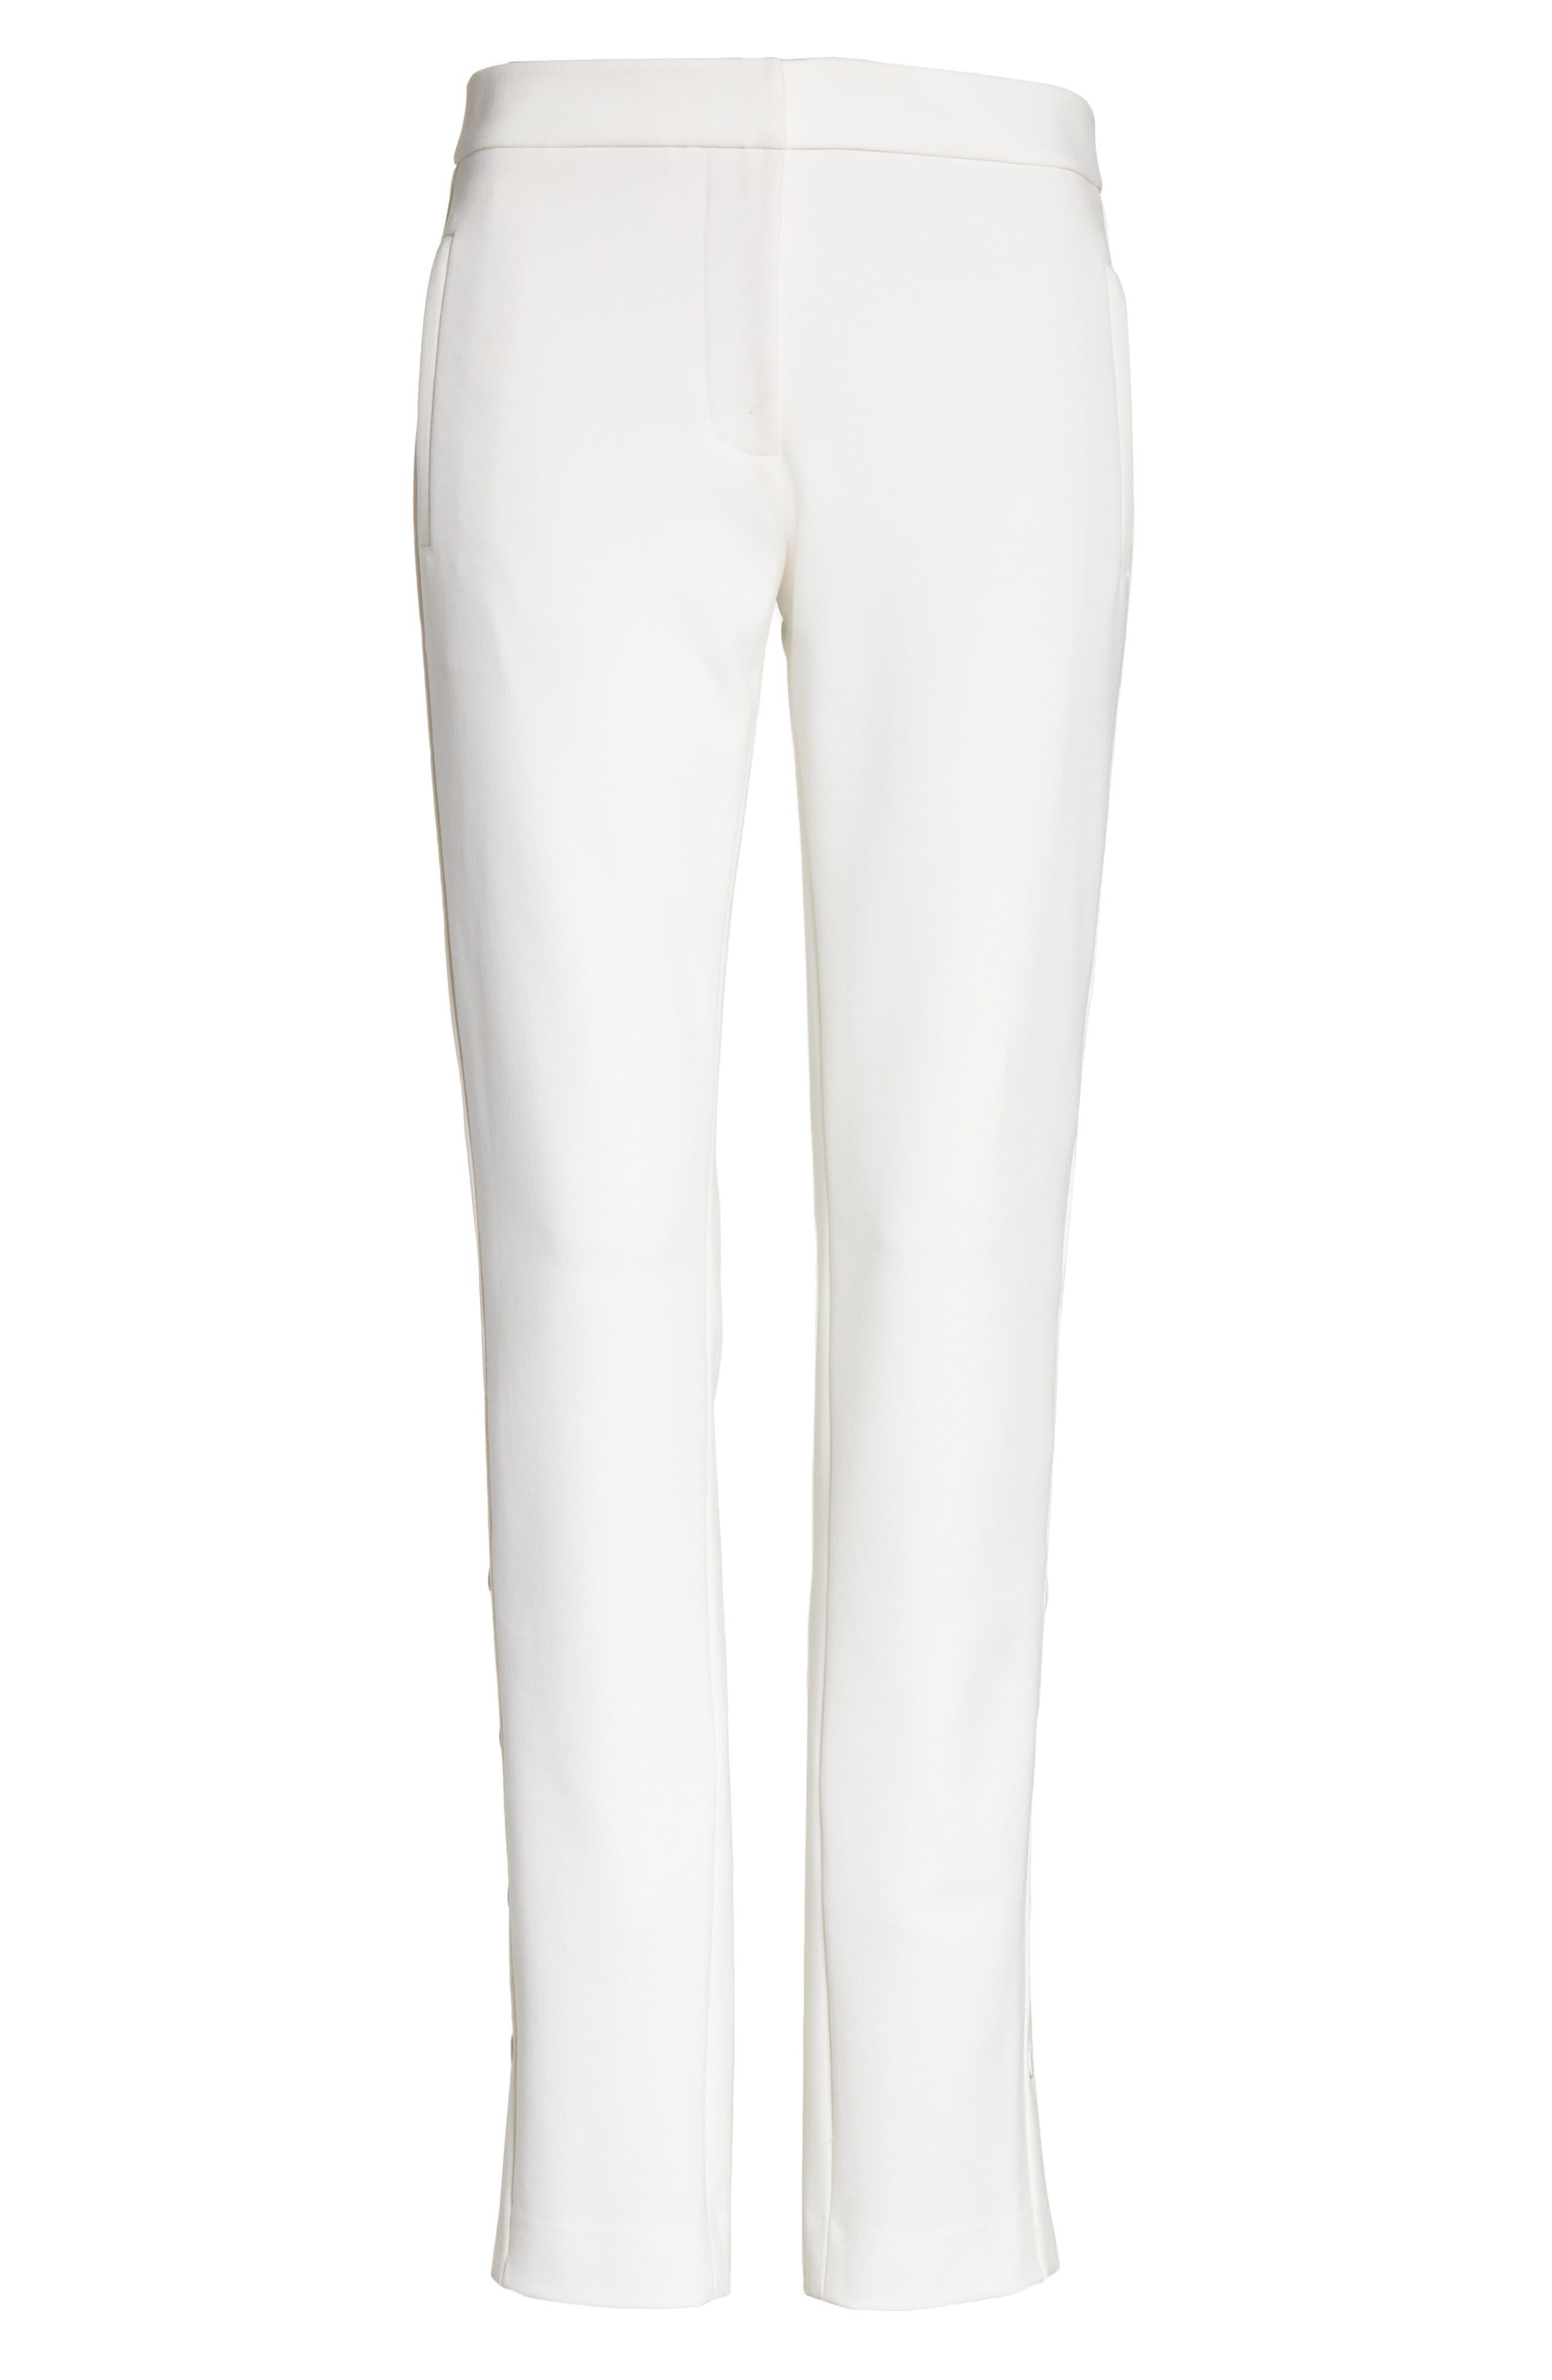 Anson Snap Side Skinny Pants,                             Alternate thumbnail 6, color,                             Ivory